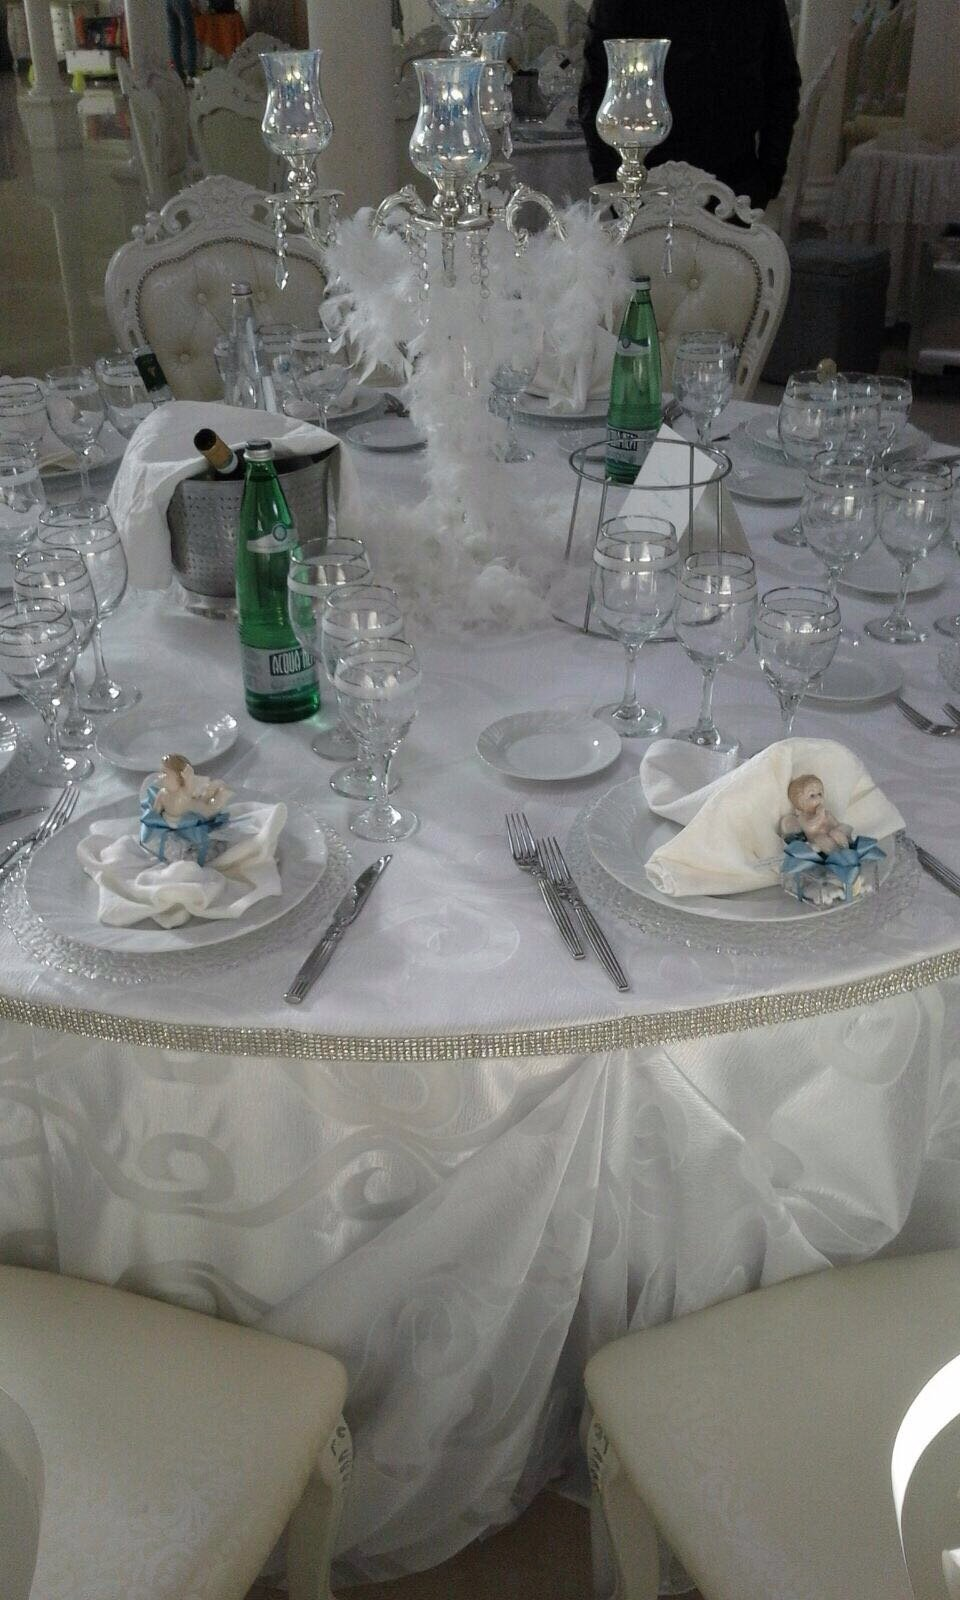 tavolo imbandito per cerimonie